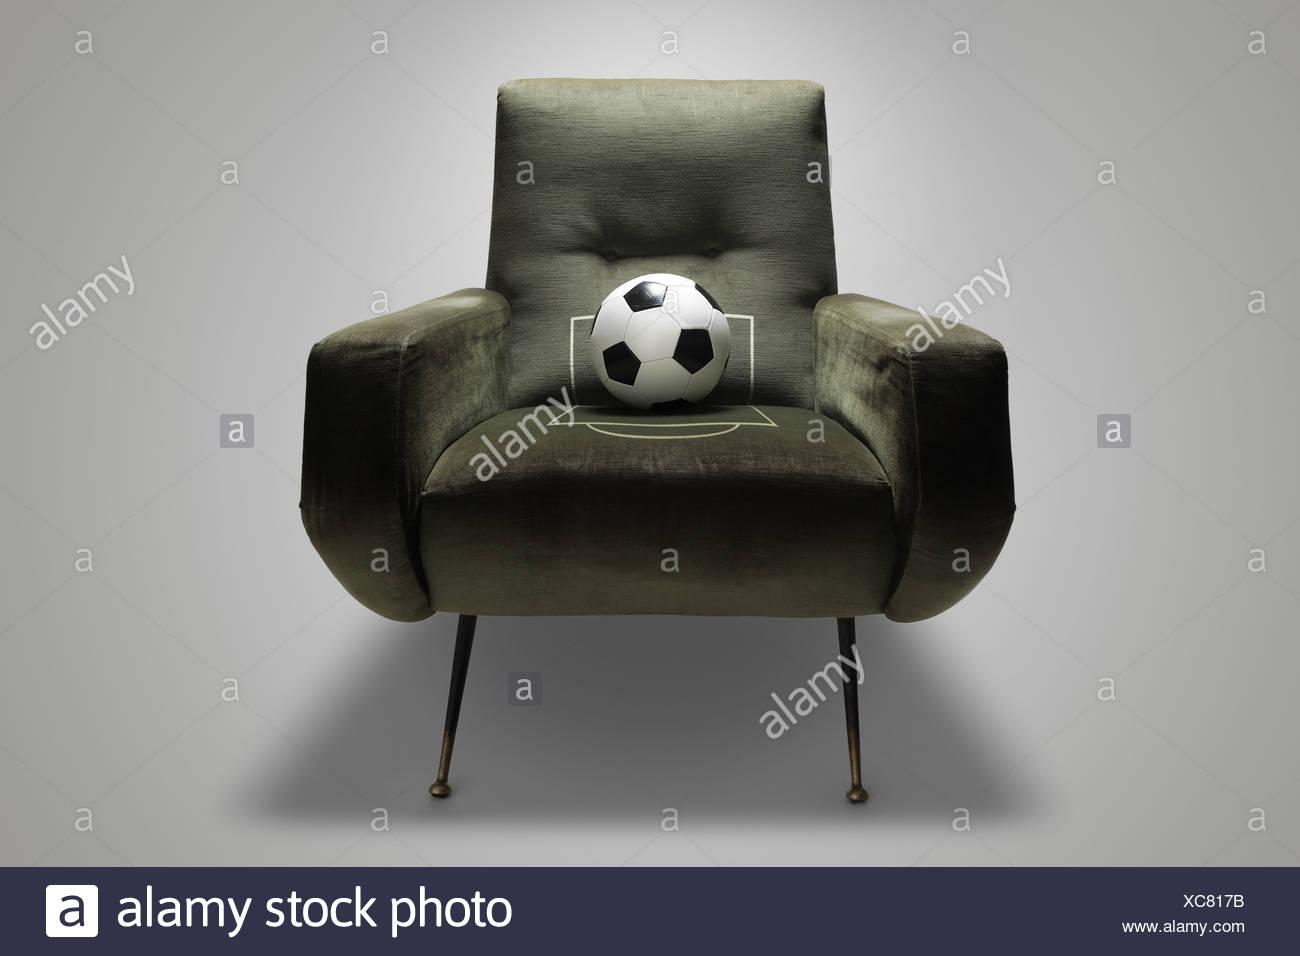 Soccer - Stock Image